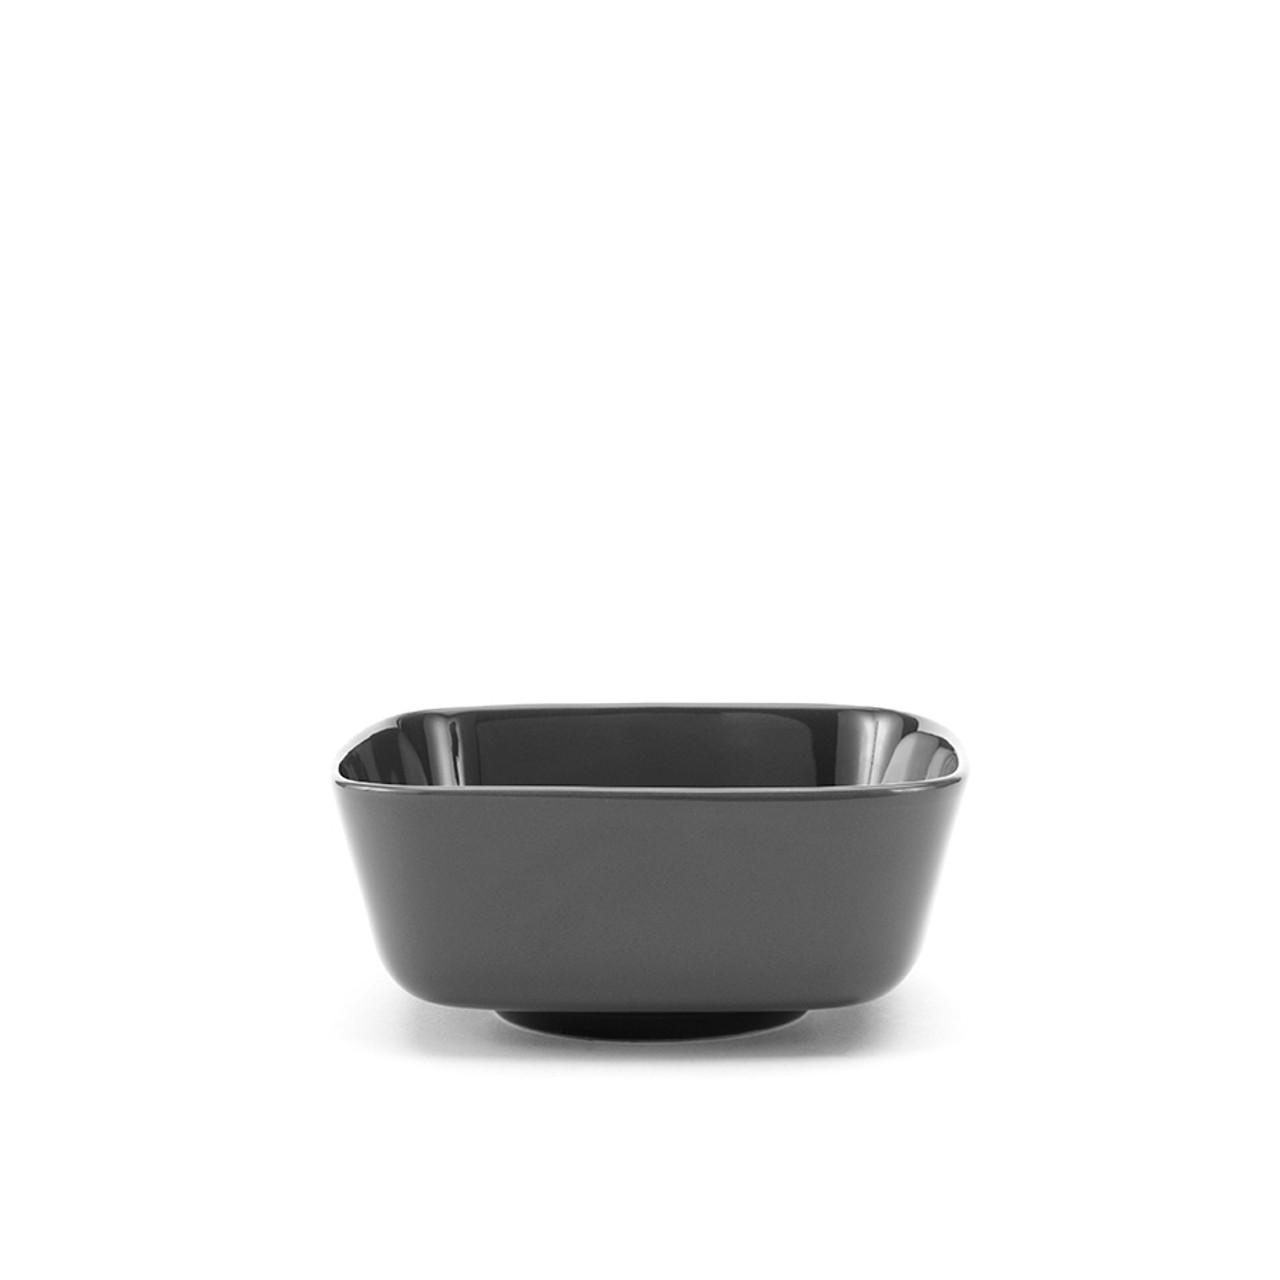 Karo - Charcoal-Grey Dinnerware set 16pc